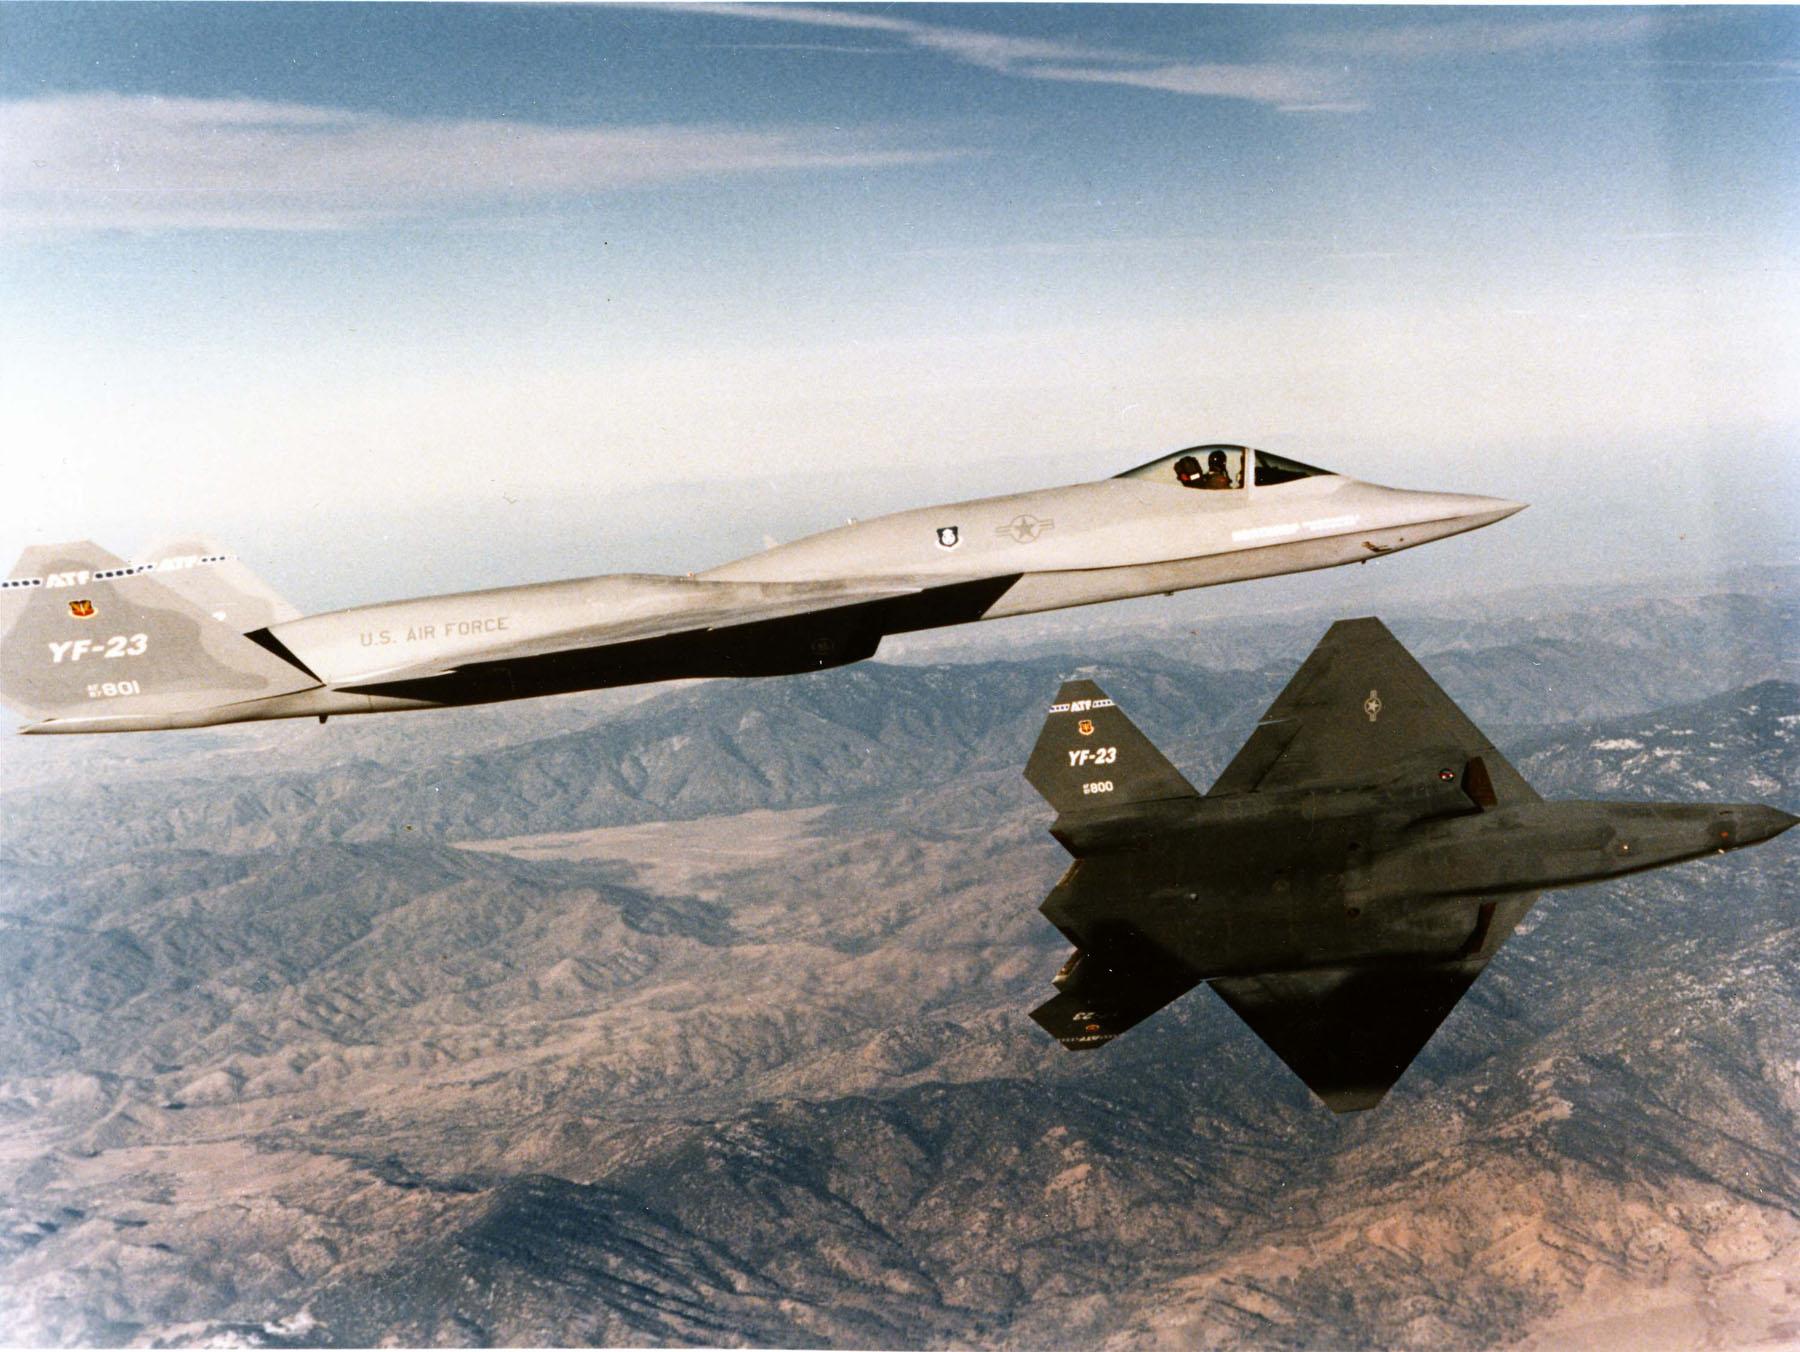 YF 23 (航空機)の画像 p1_20